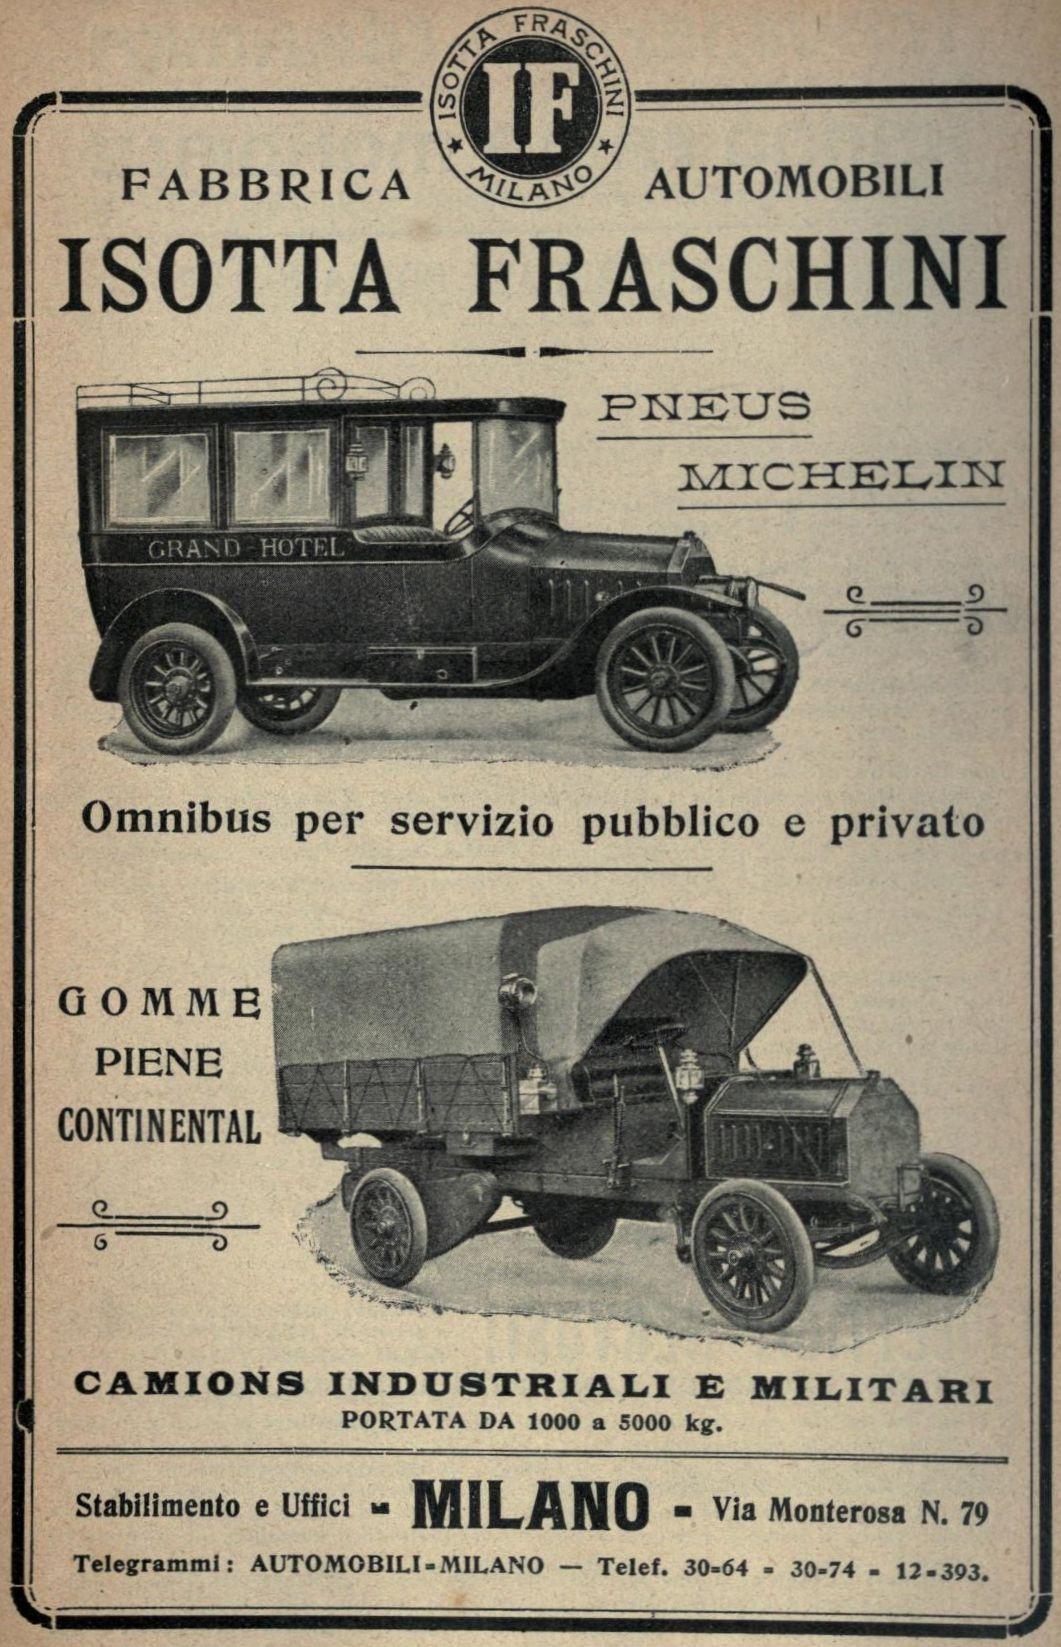 Fabbrica automobili Isotta Fraschini